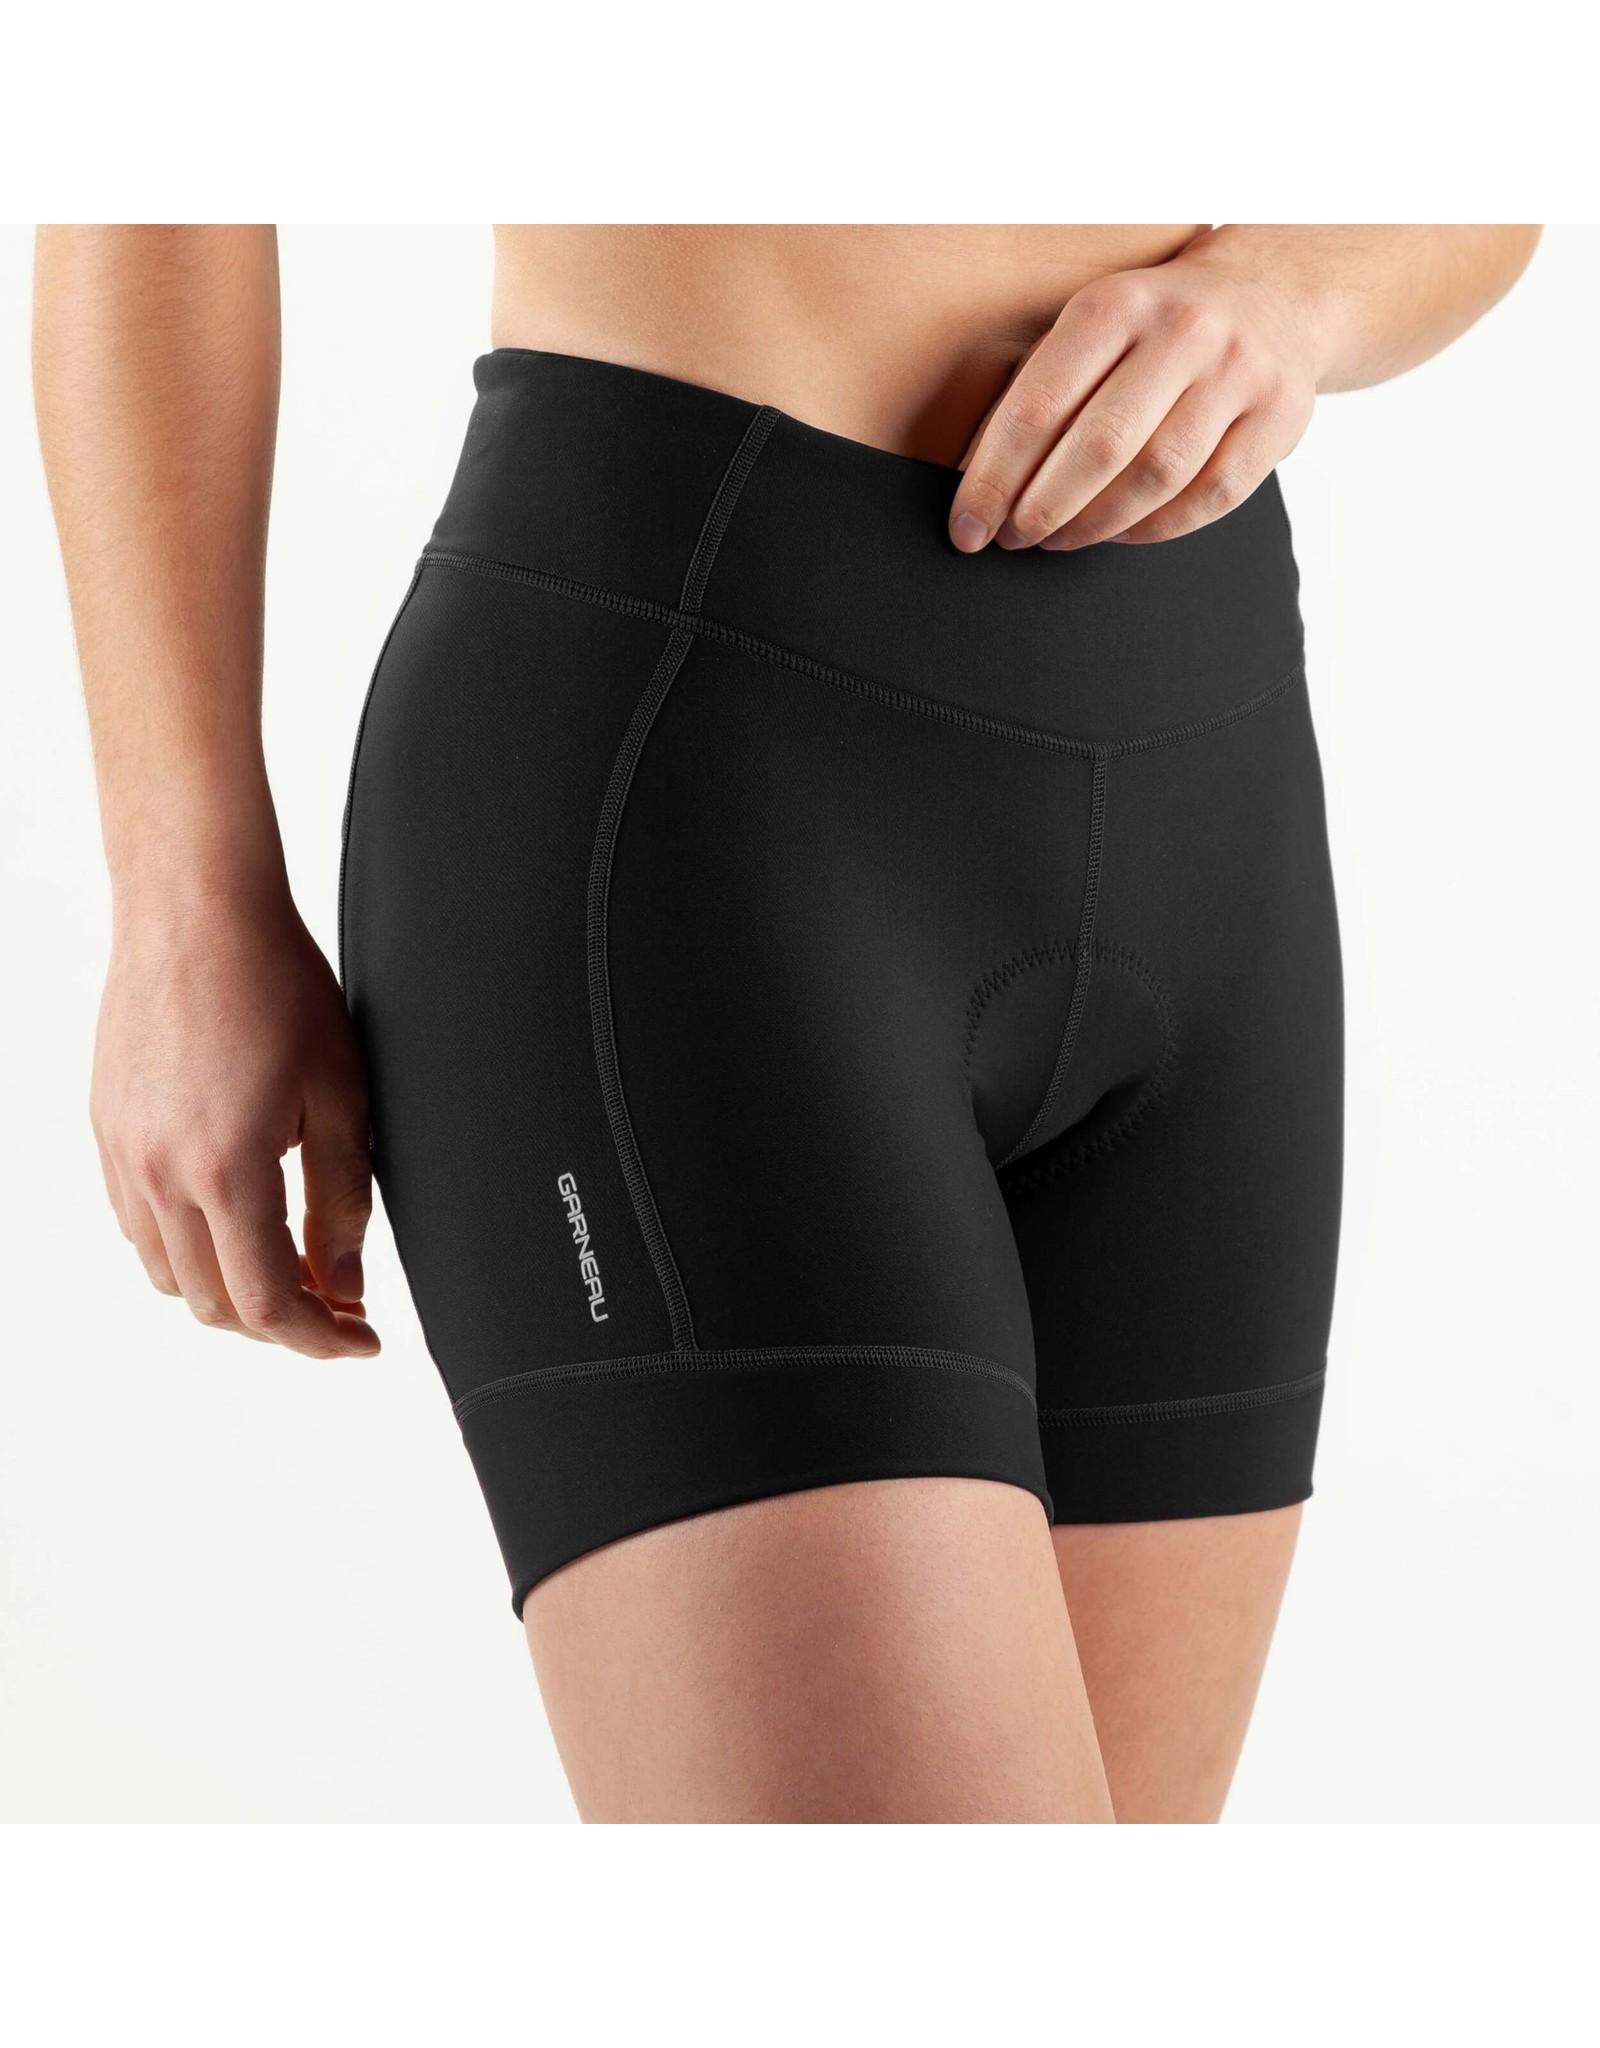 Garneau Garneau - Women Fit Sensor 5.5 Short 2 Black M